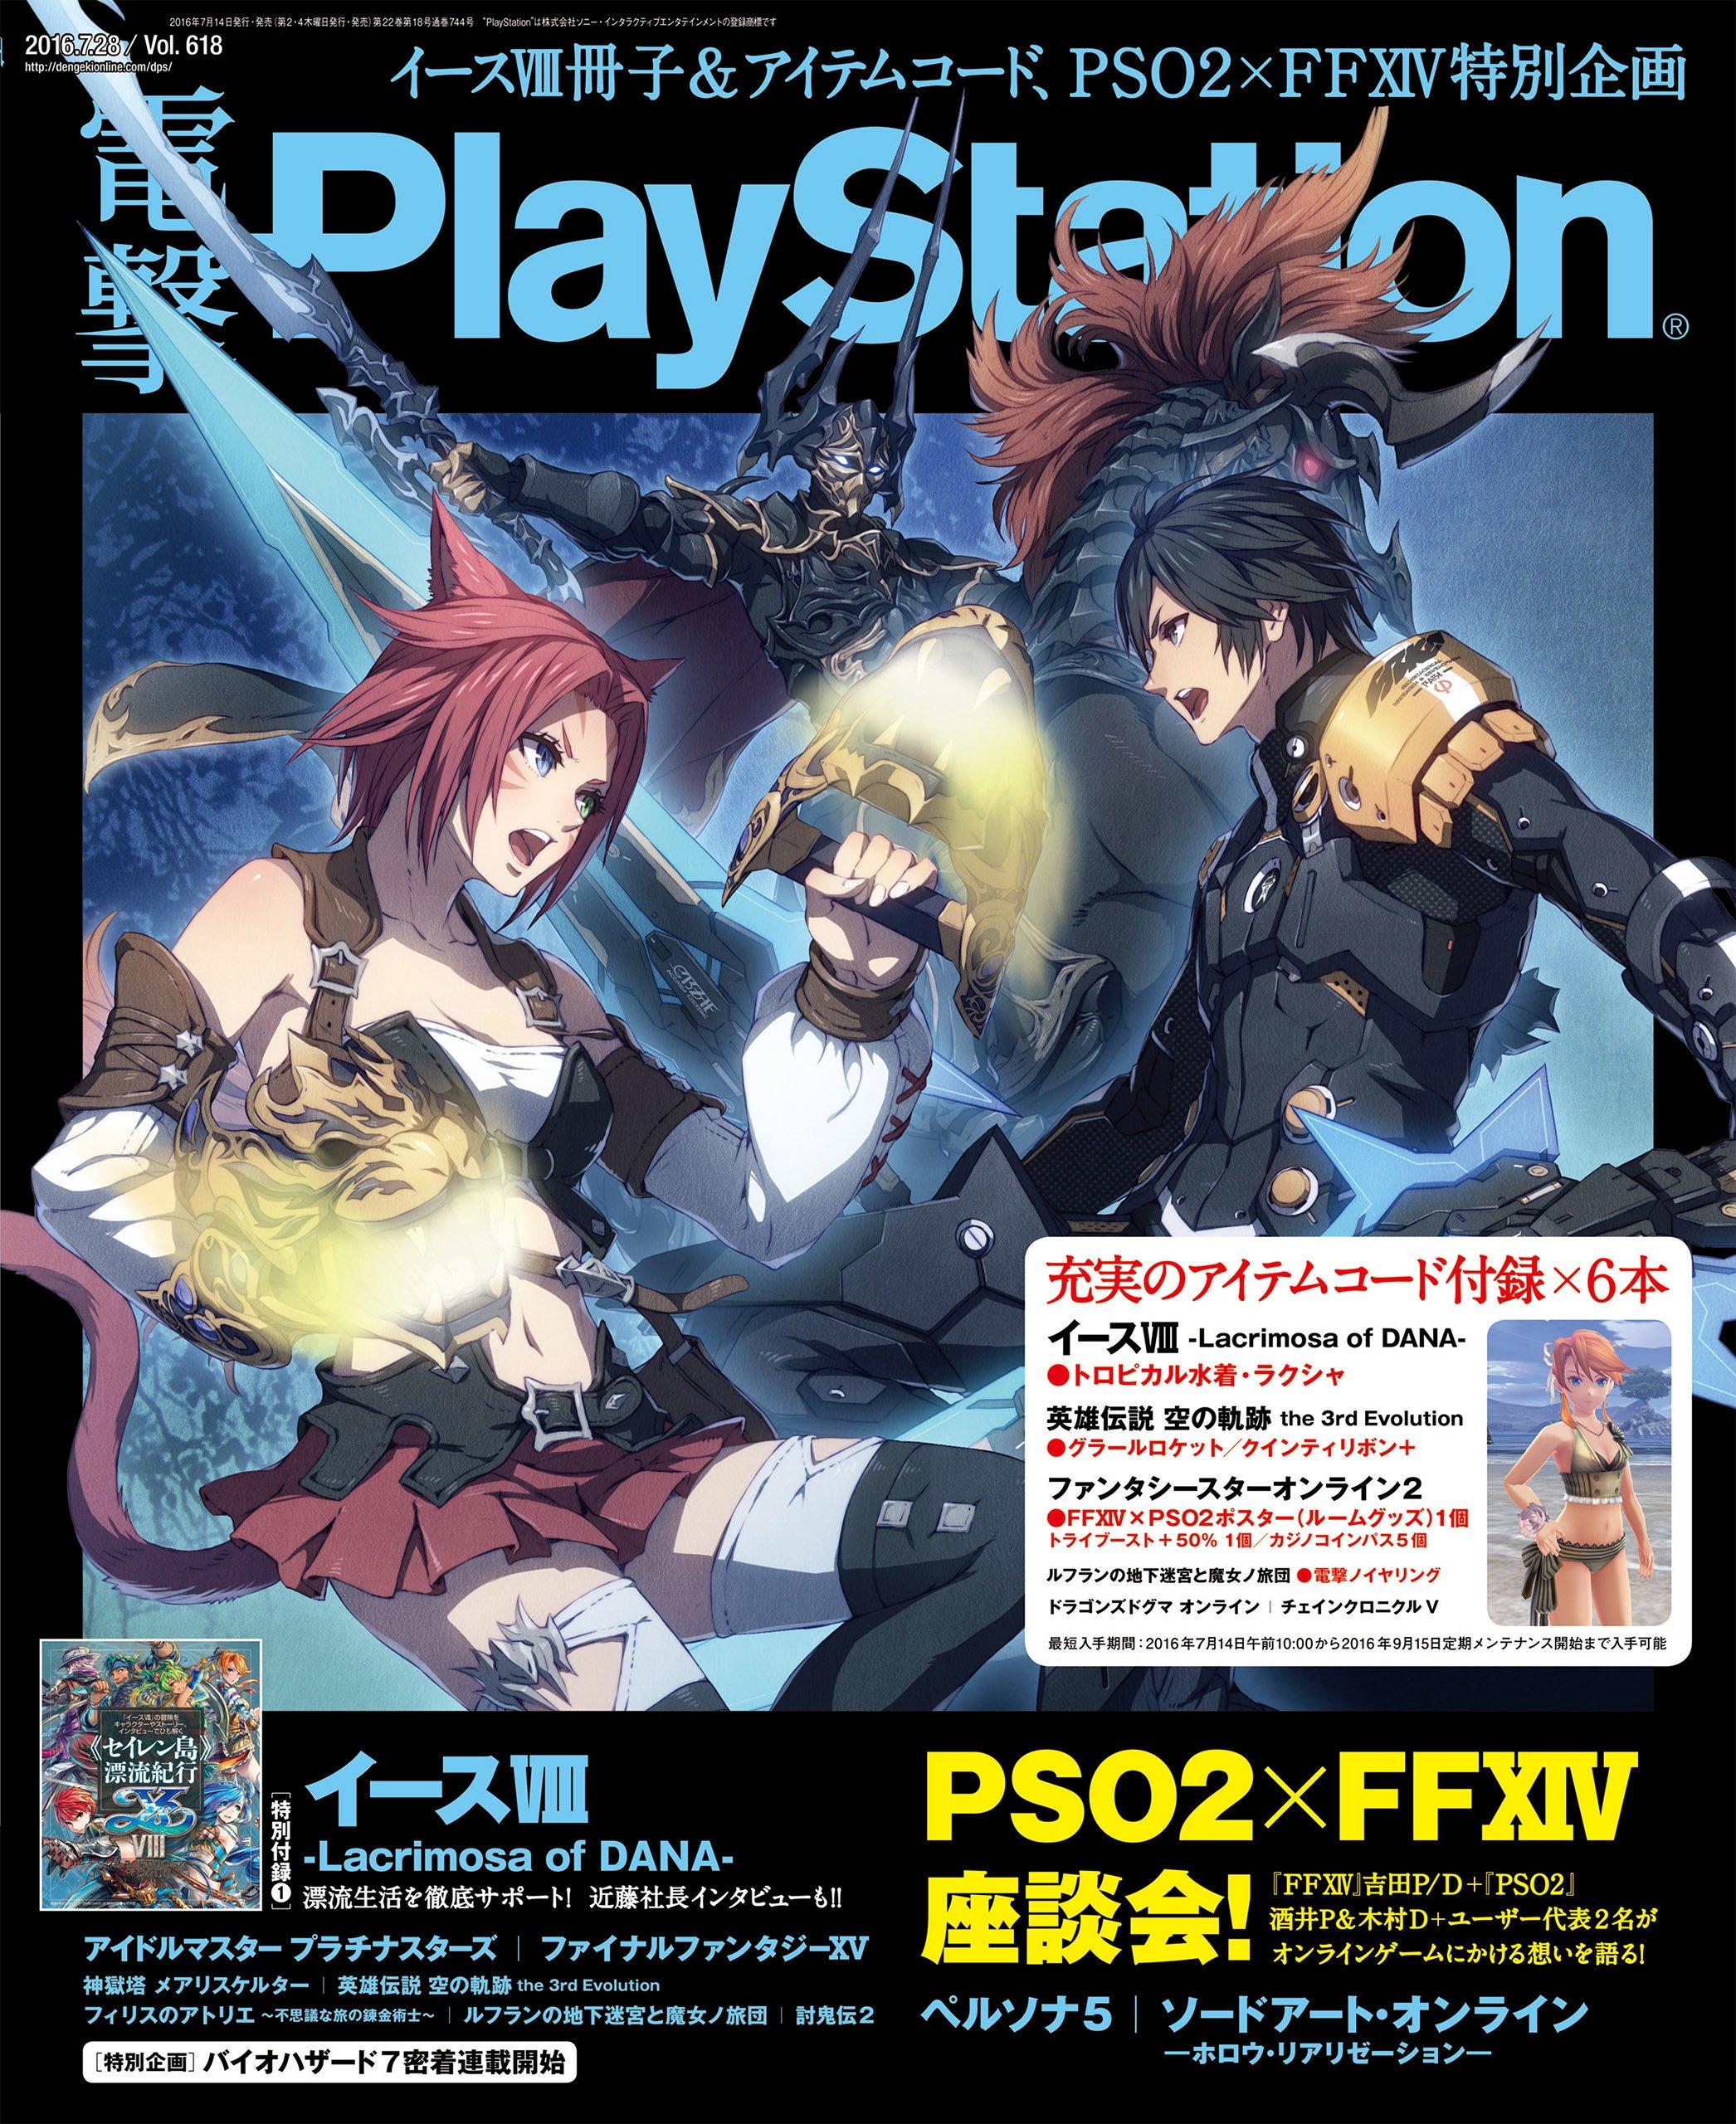 Dengeki PlayStation 618 (July 28, 2016)